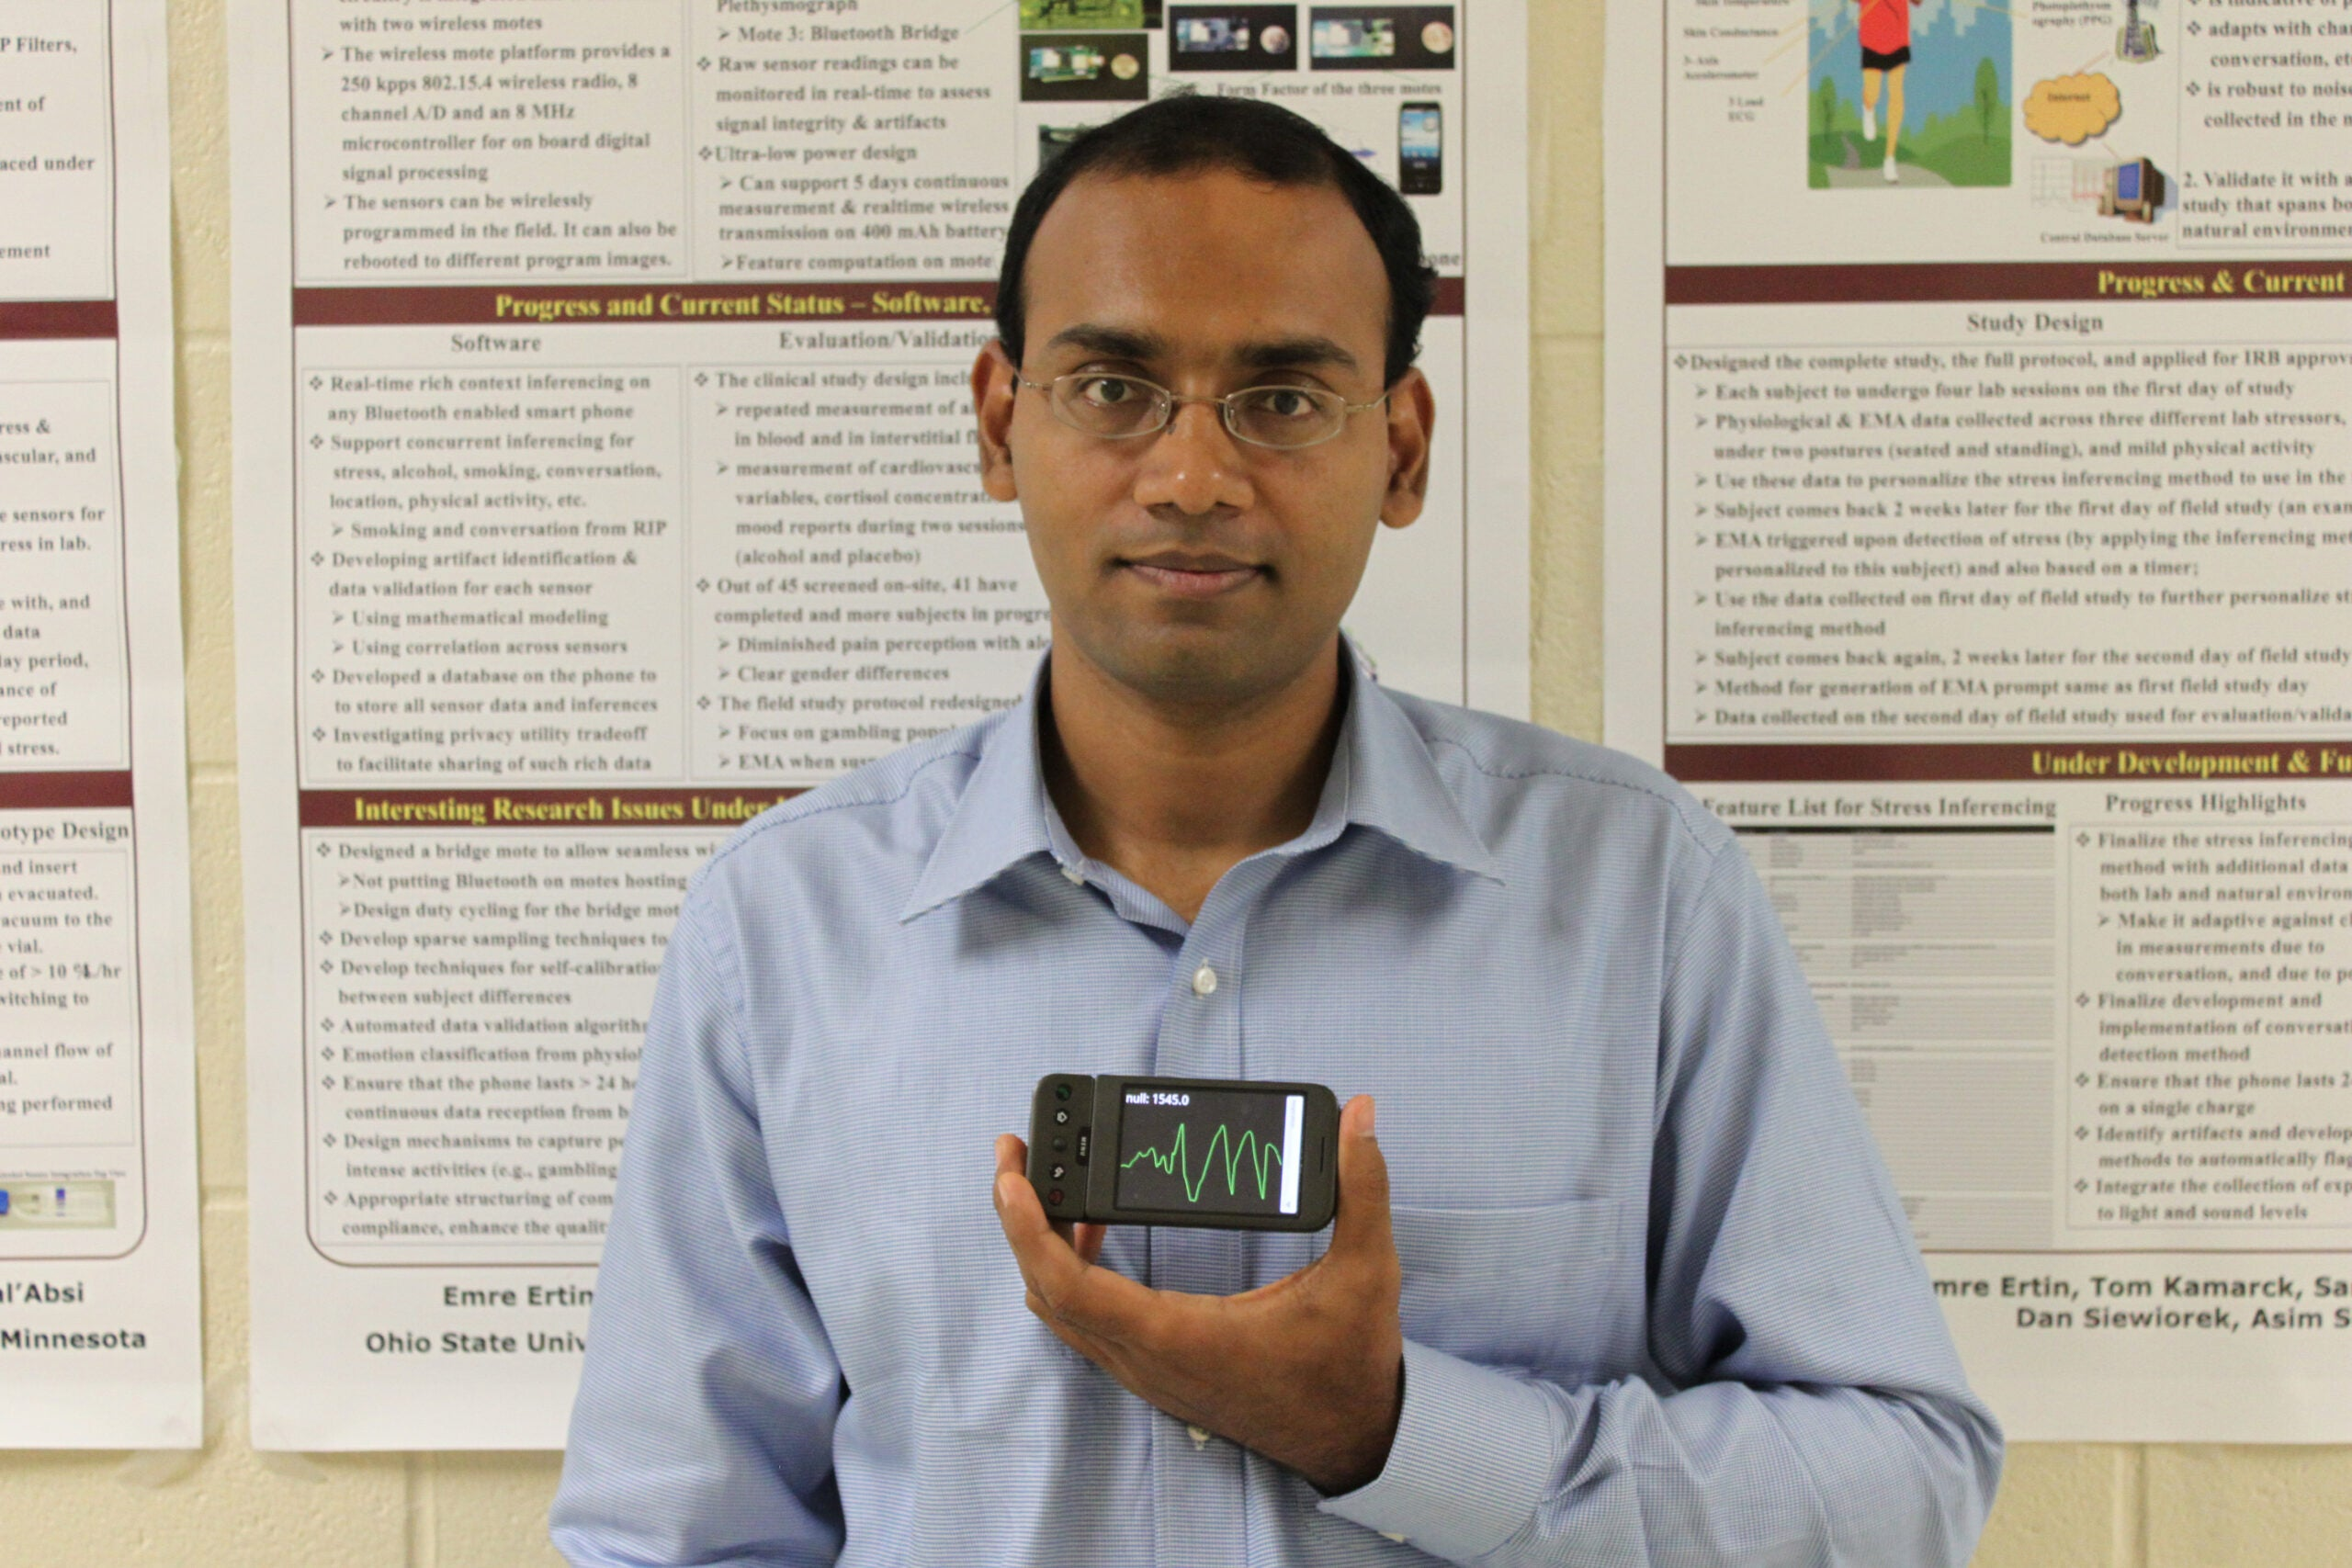 Brilliant 10: Santosh Kumar, the Sensor Guru